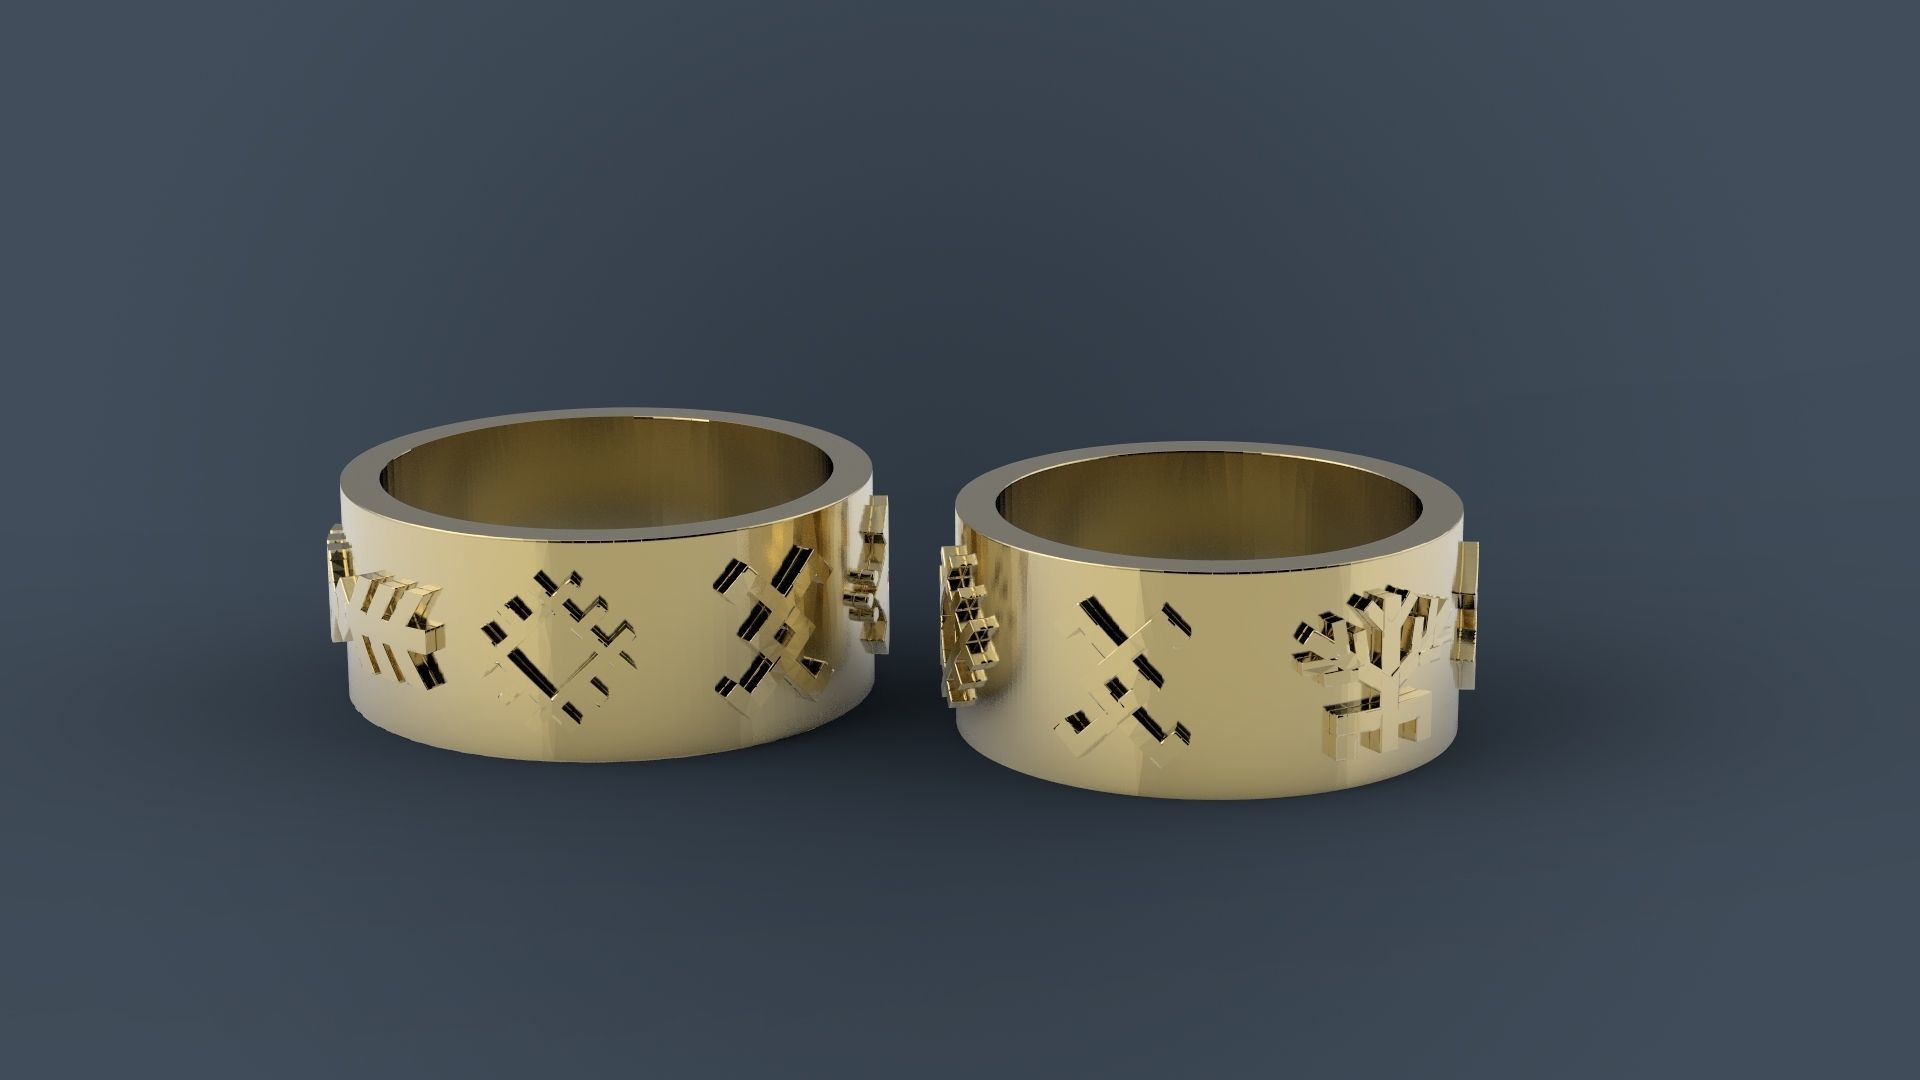 Latvian wedding rings